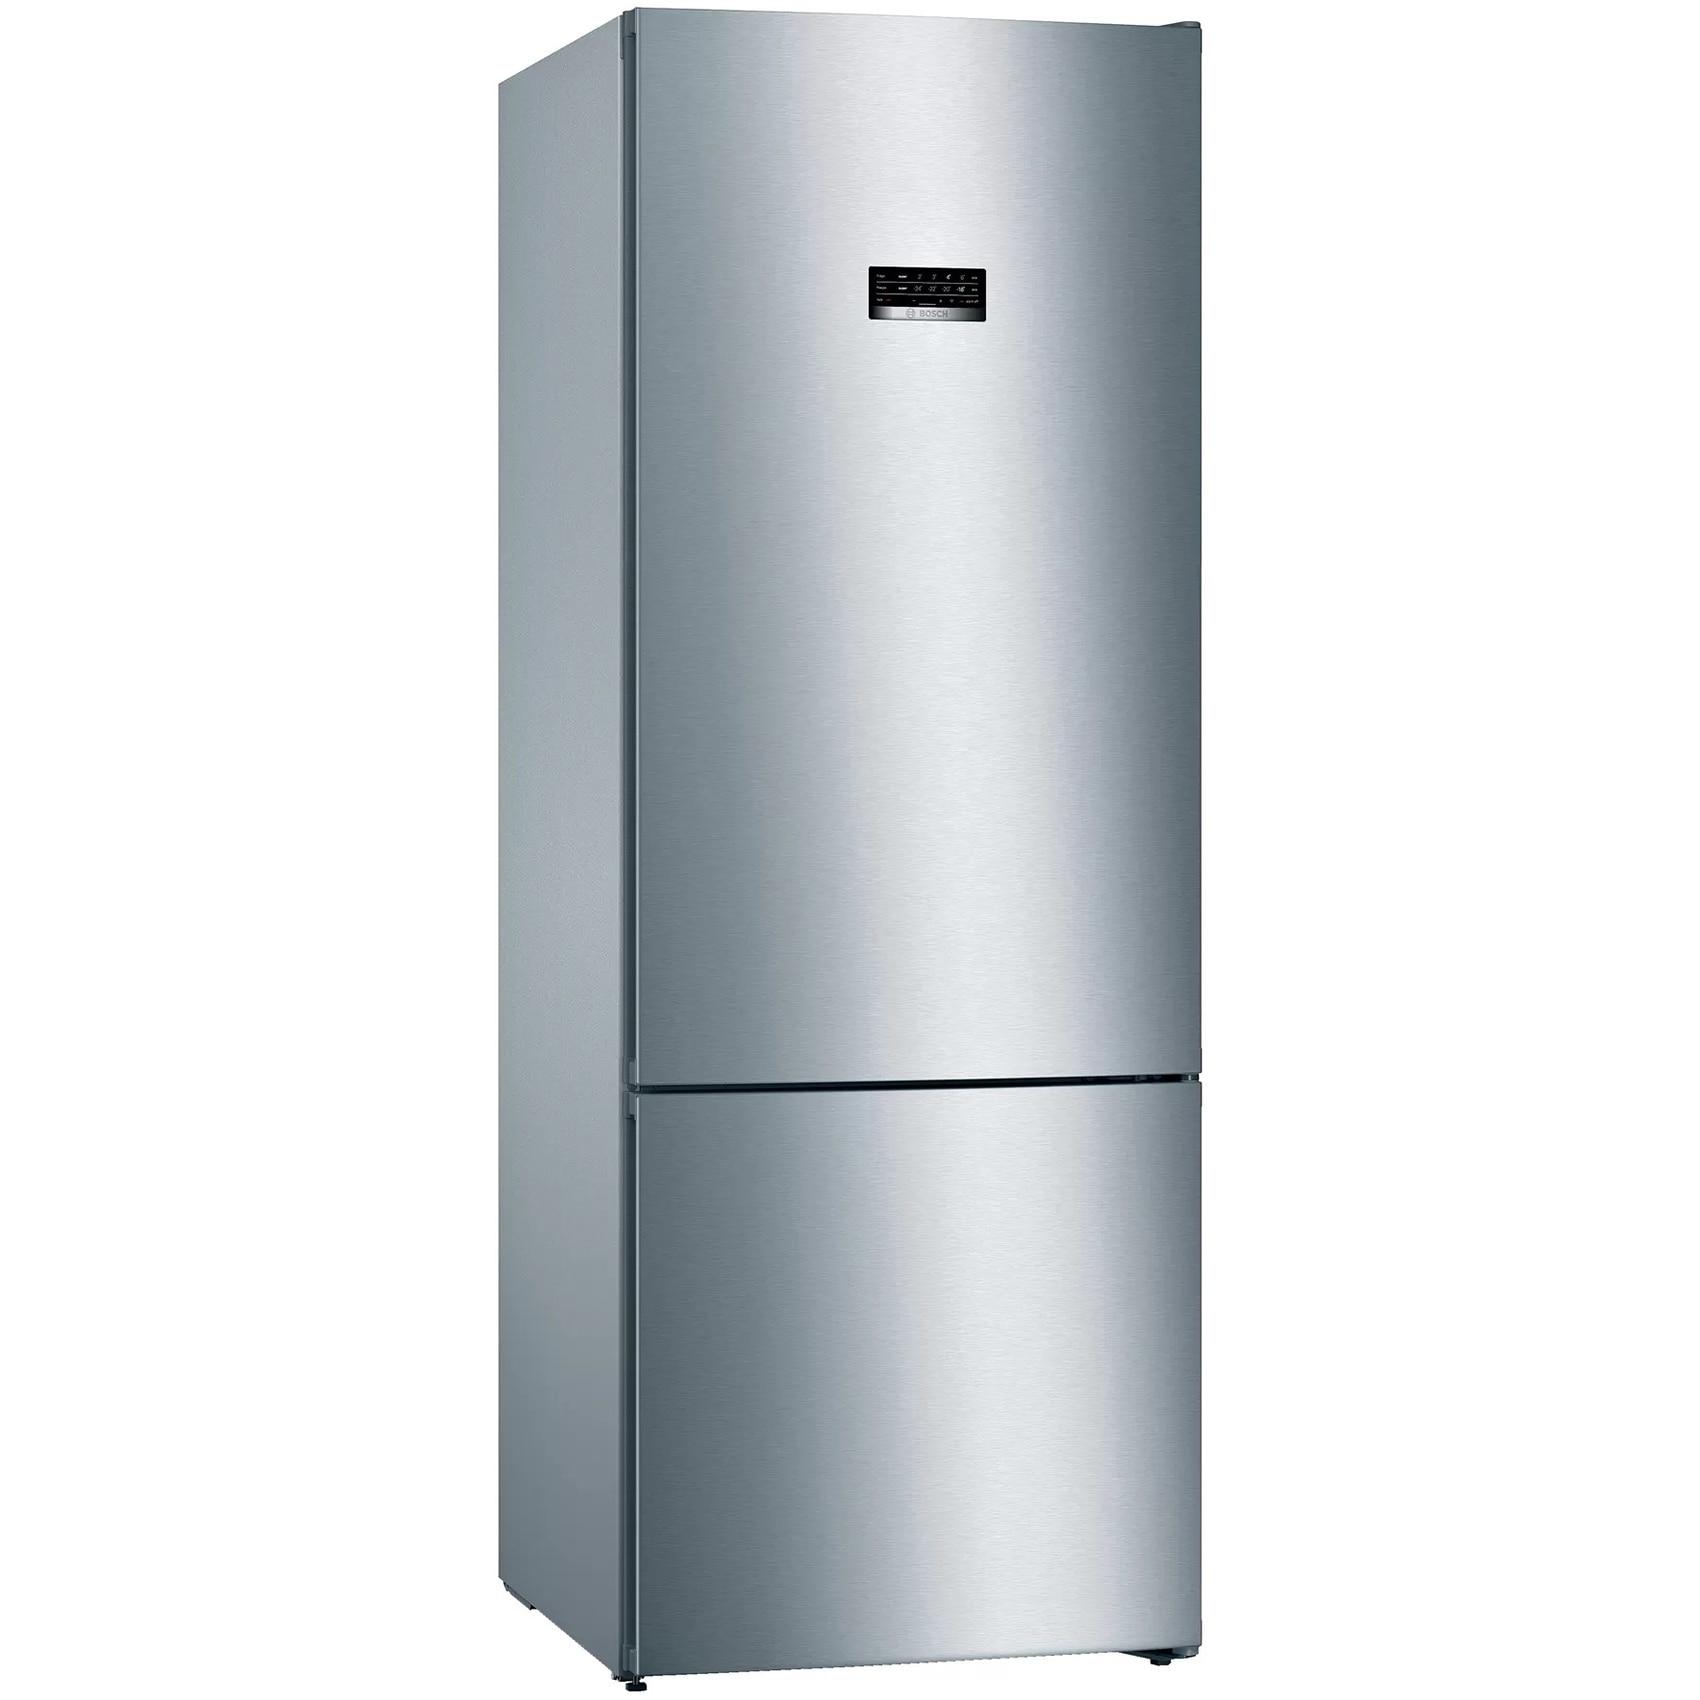 Fotografie Combina frigorifica Bosch KGN56XLEA, 508 l, Clasa E, NoFrost, VitaFresh, H 193 cm, Argintiu